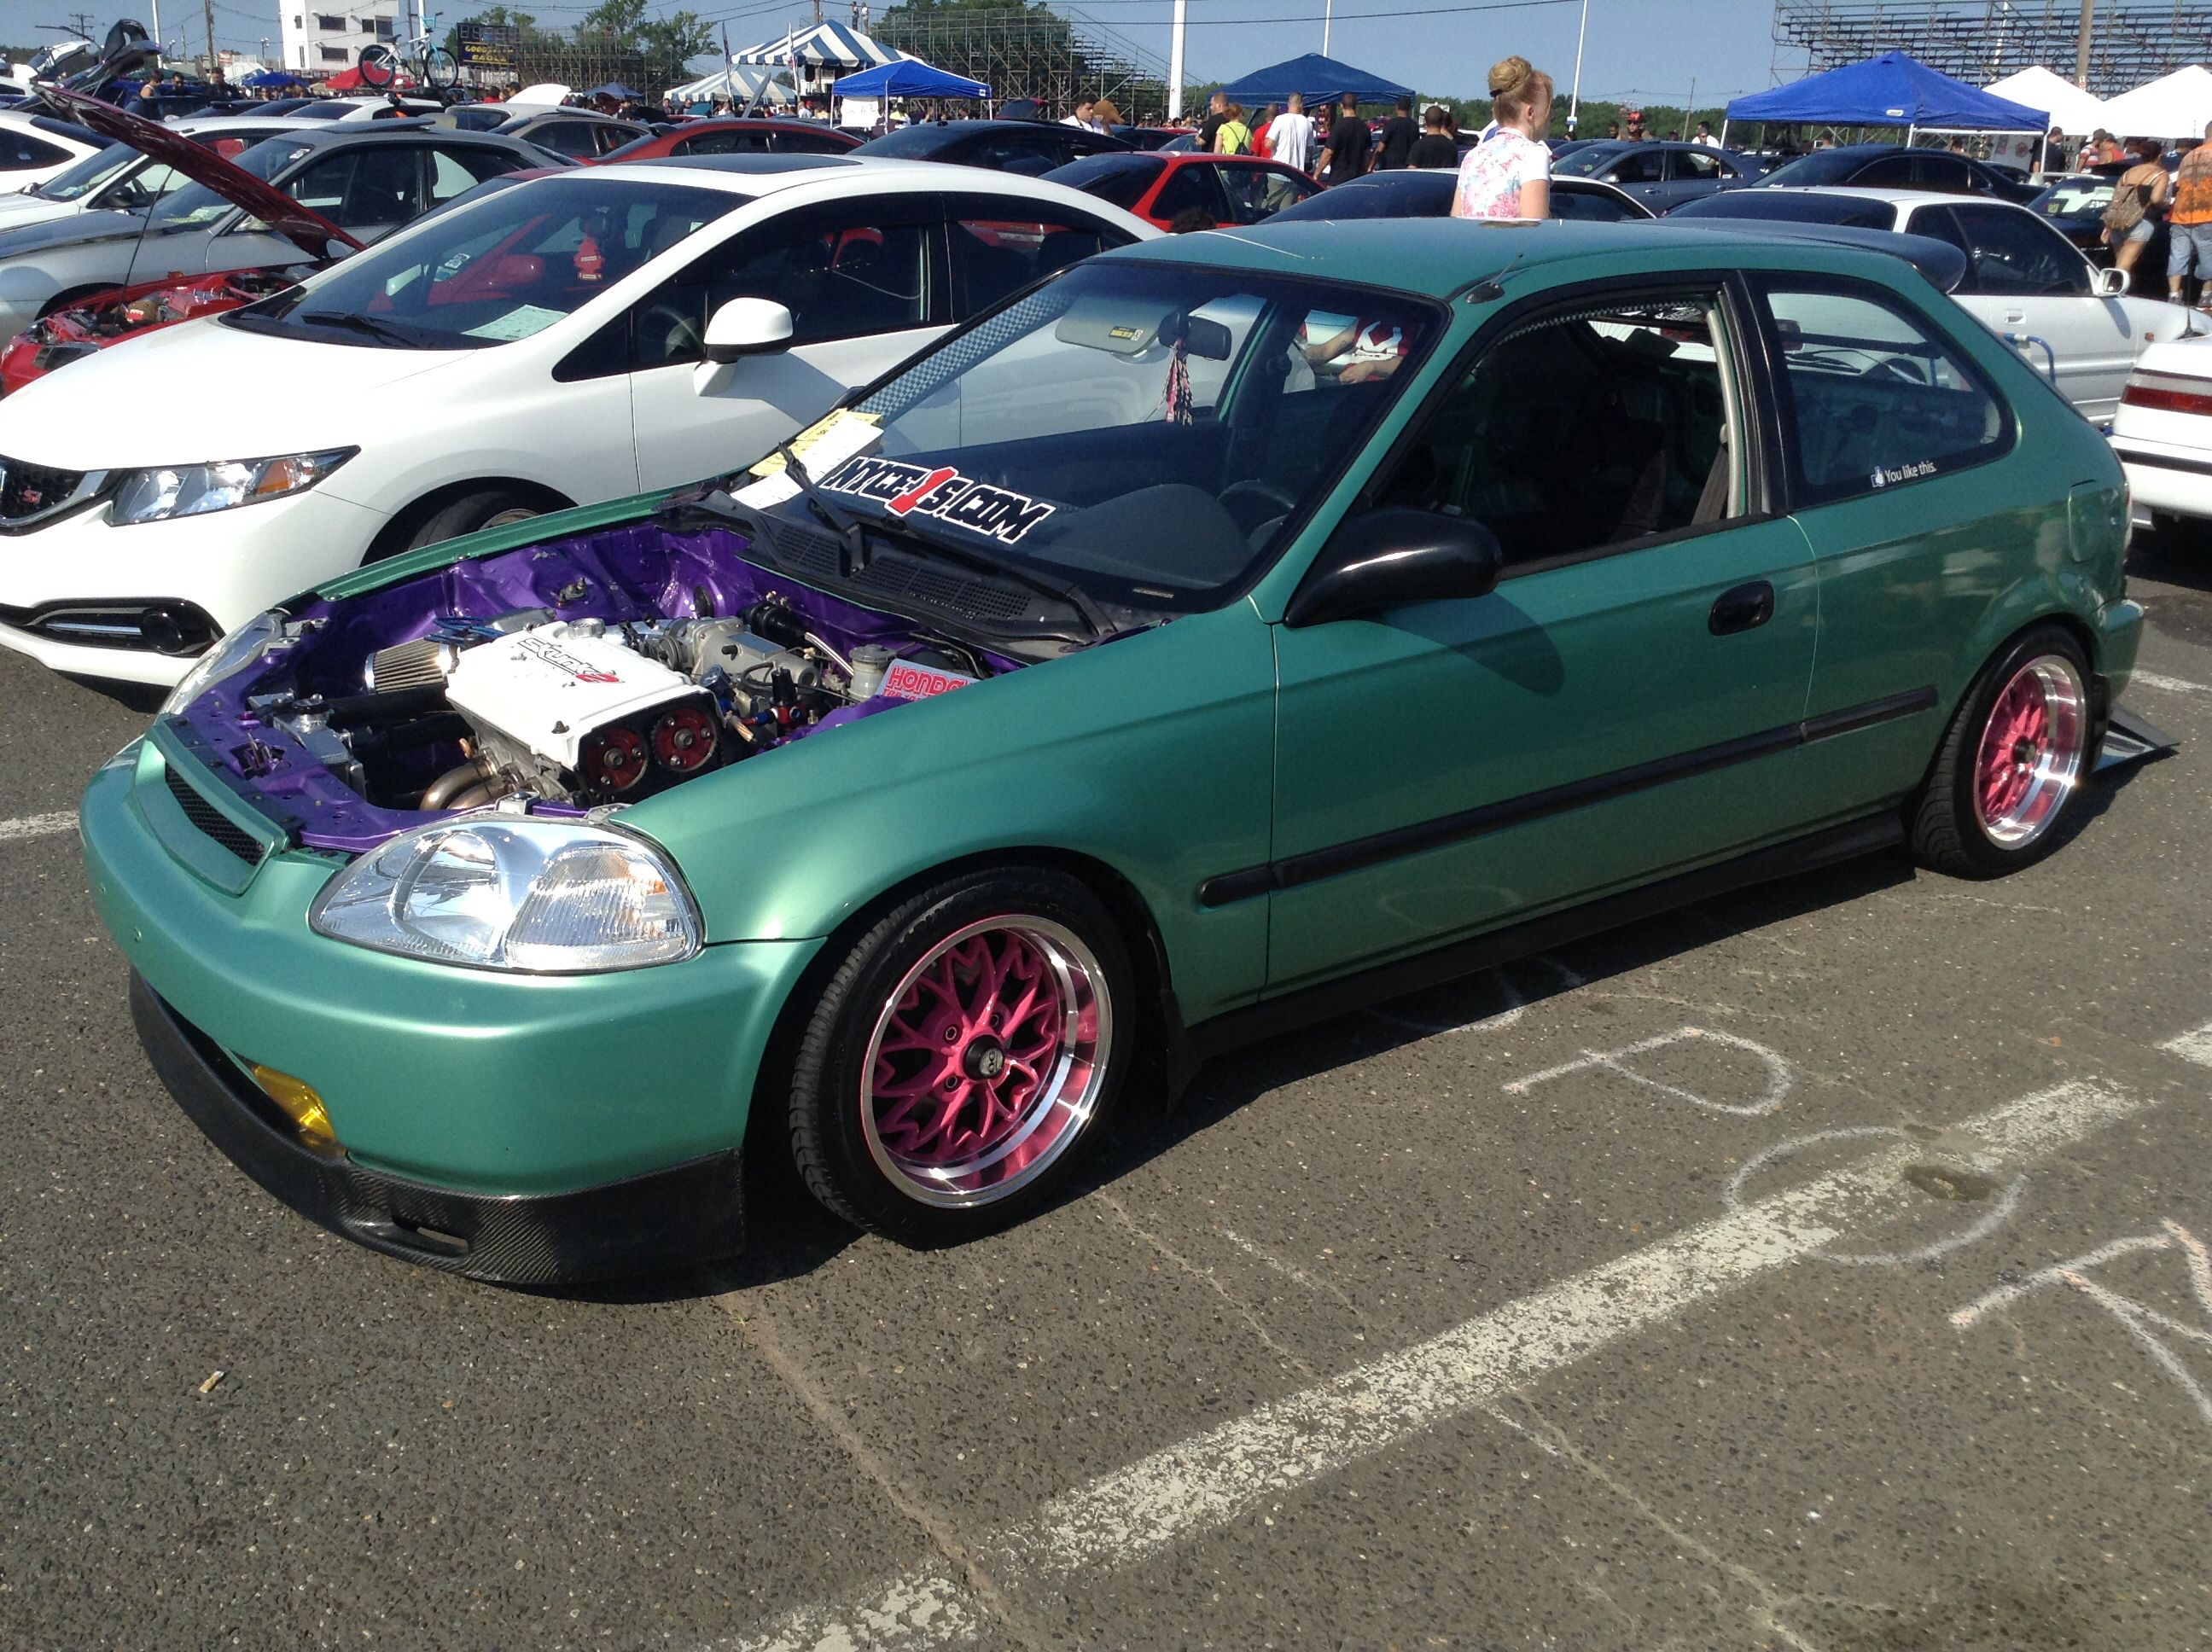 This offset honda civic that purple engine